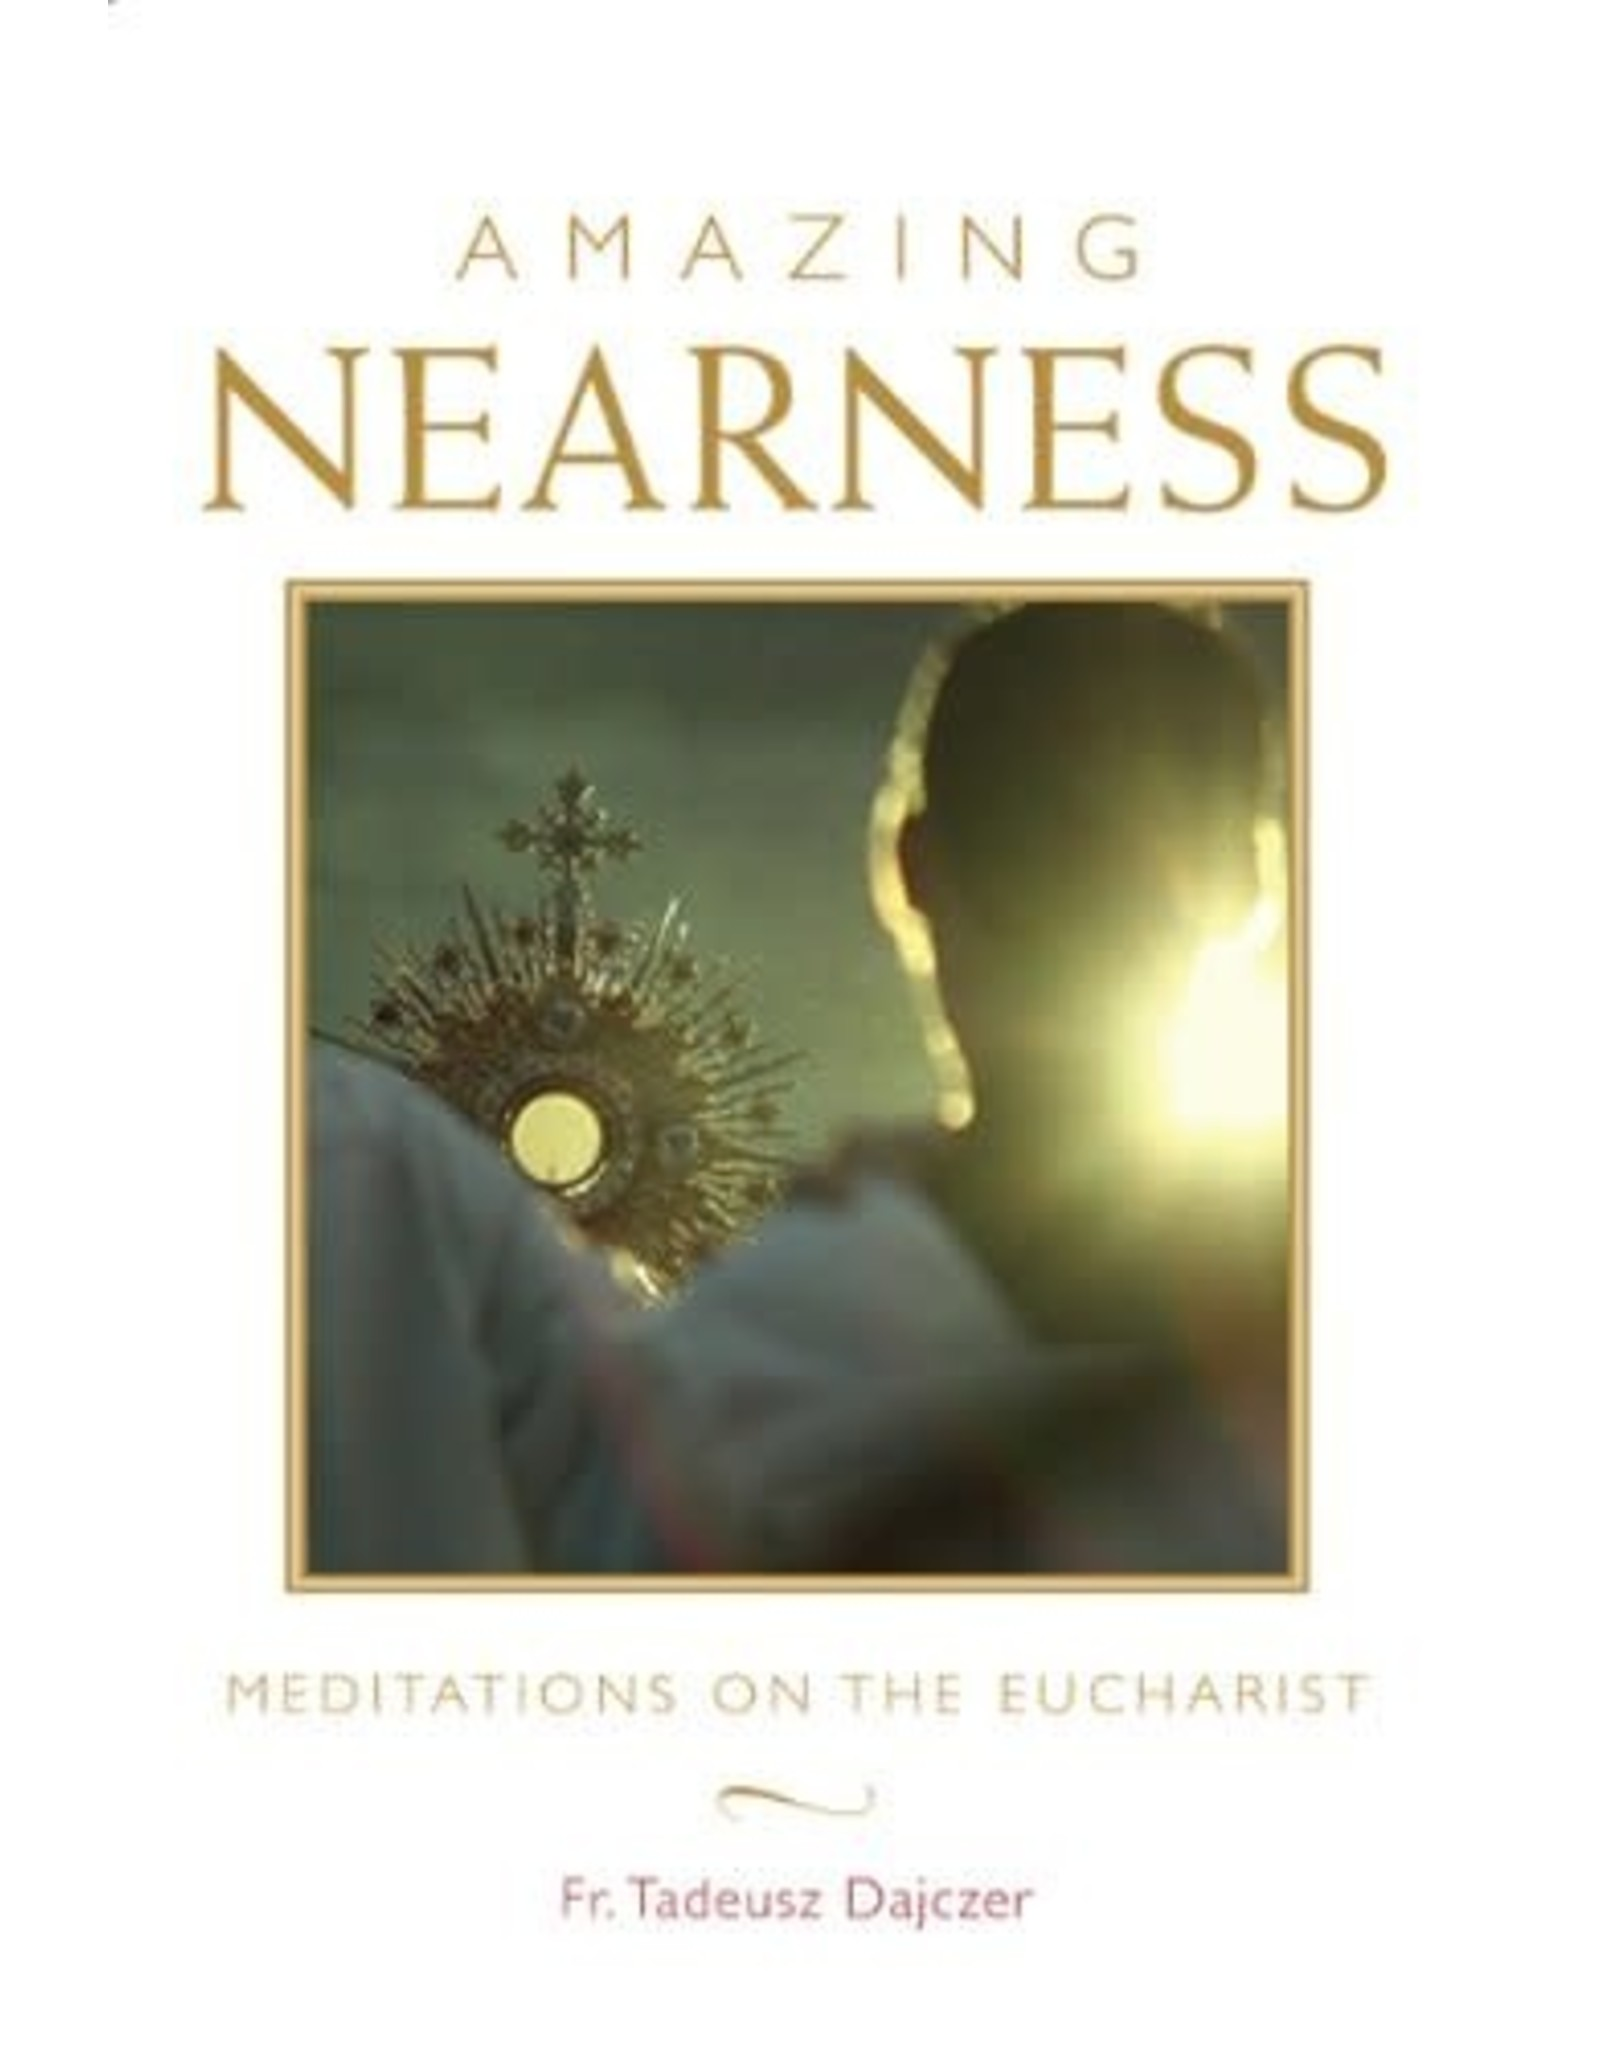 Amazing Nearness: Meditations on the Eucharist